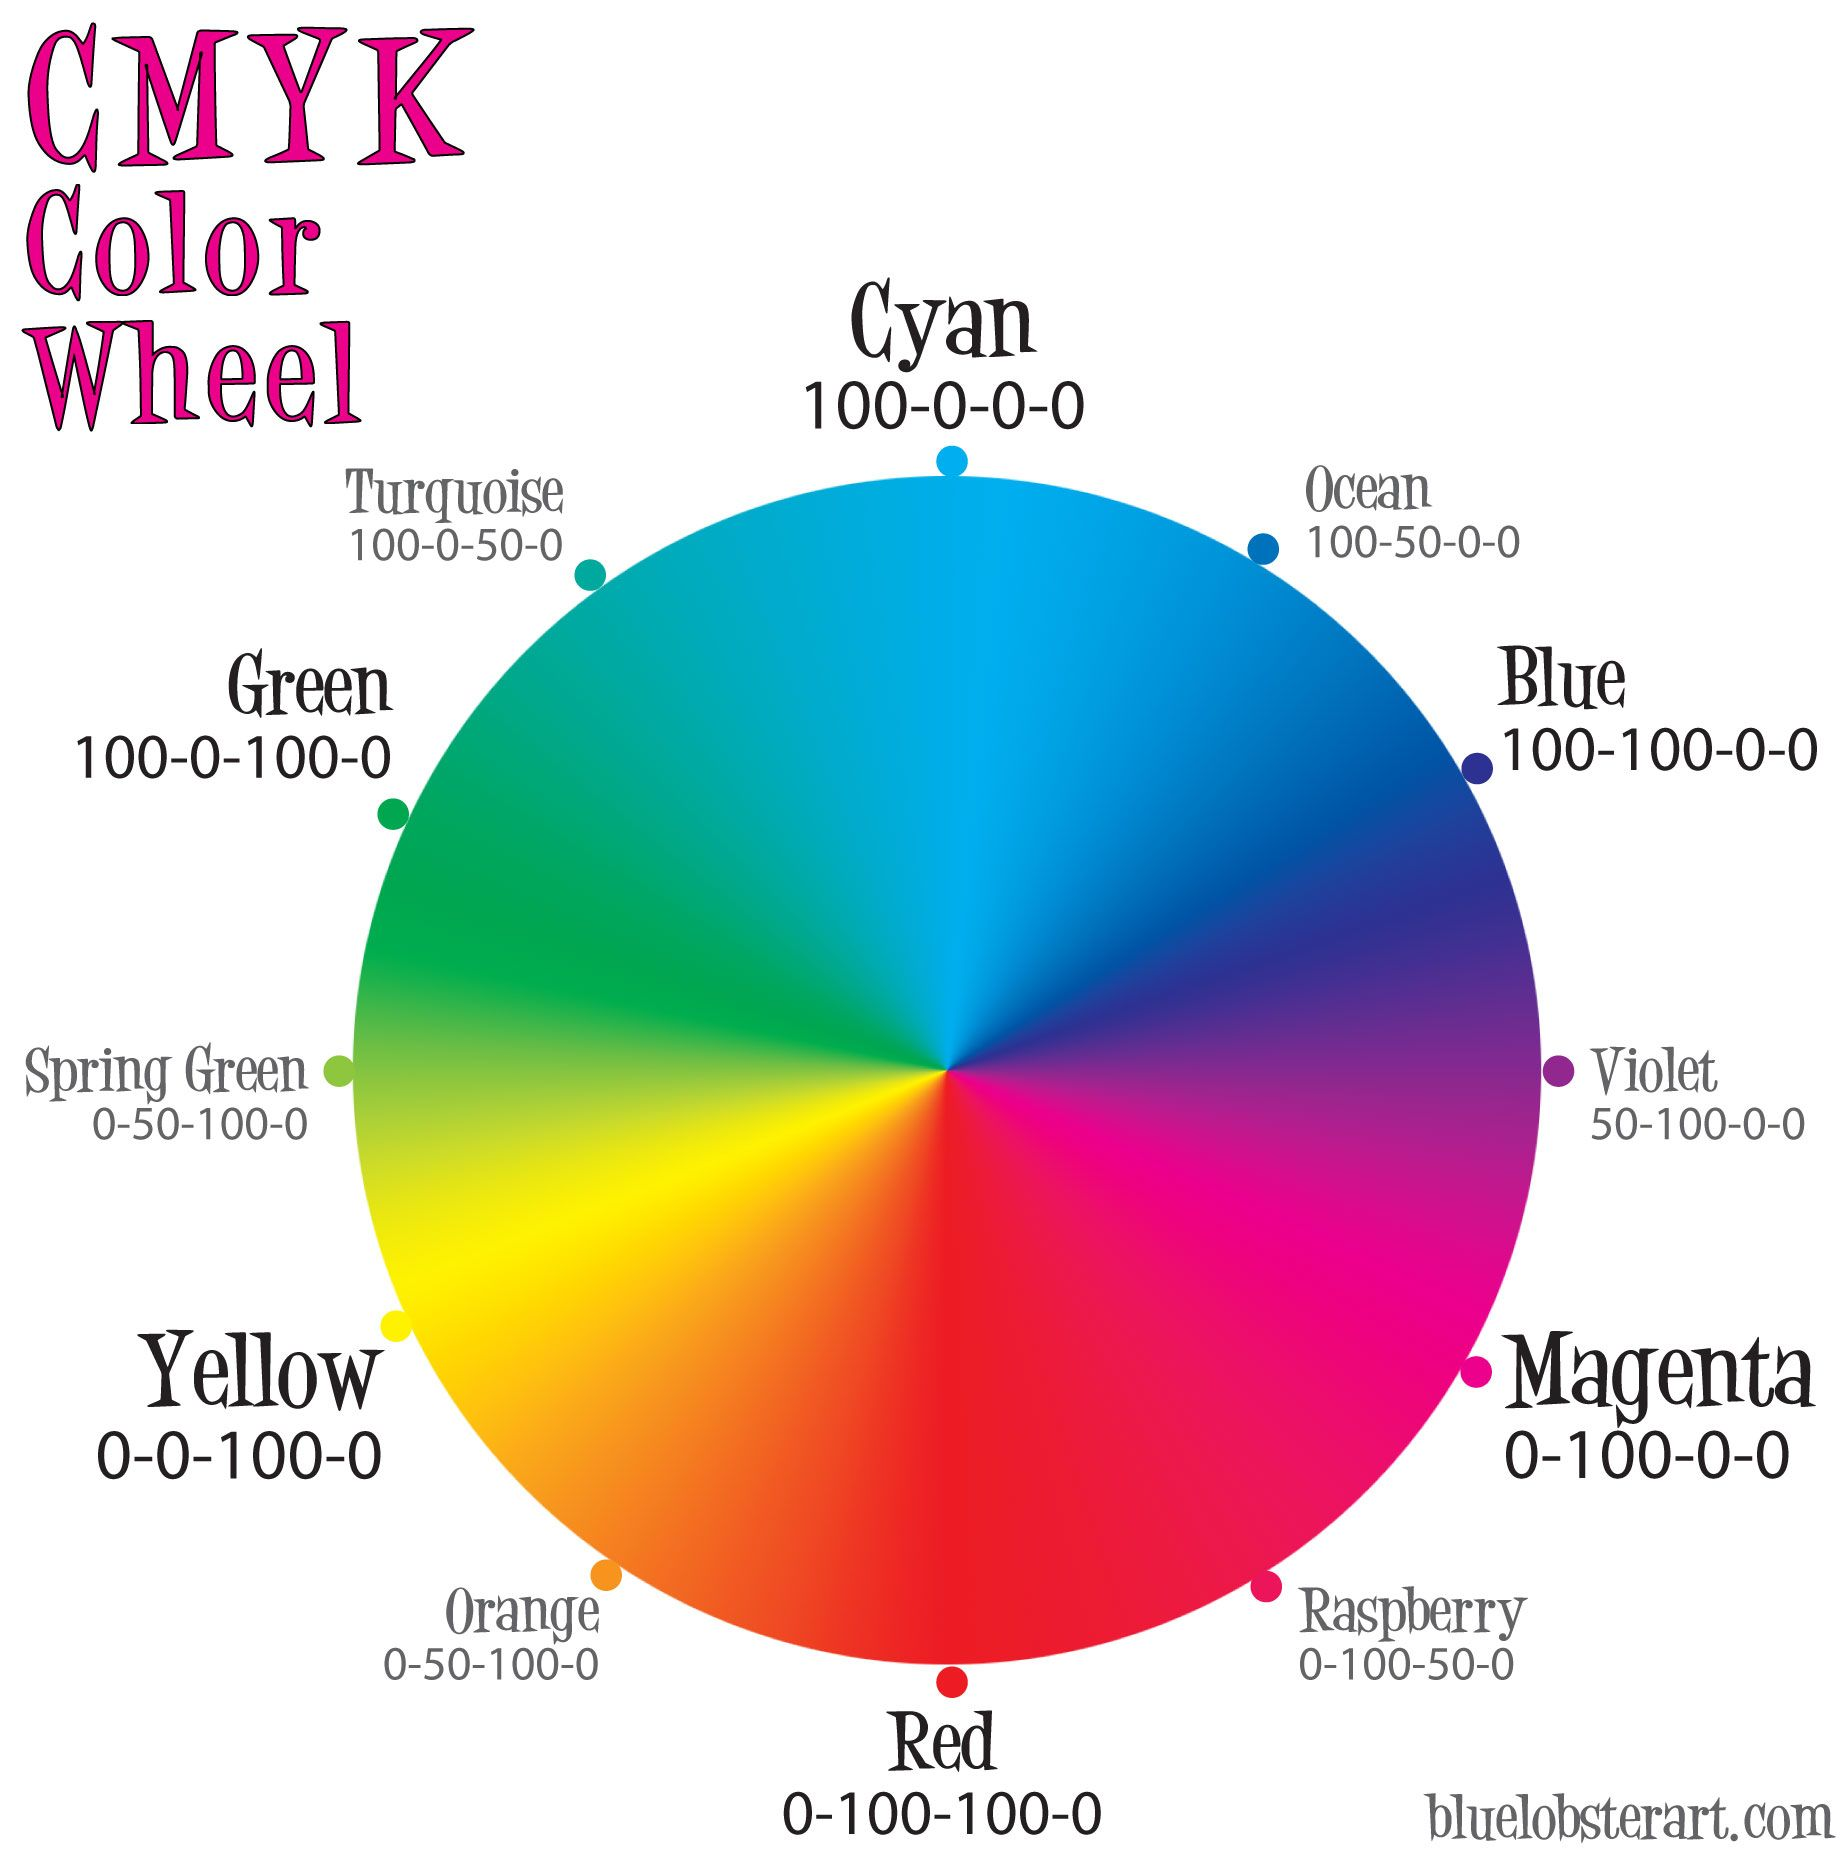 Color circle art publishing - The Cmyk Color Wheel Blue Lobster Art And Design